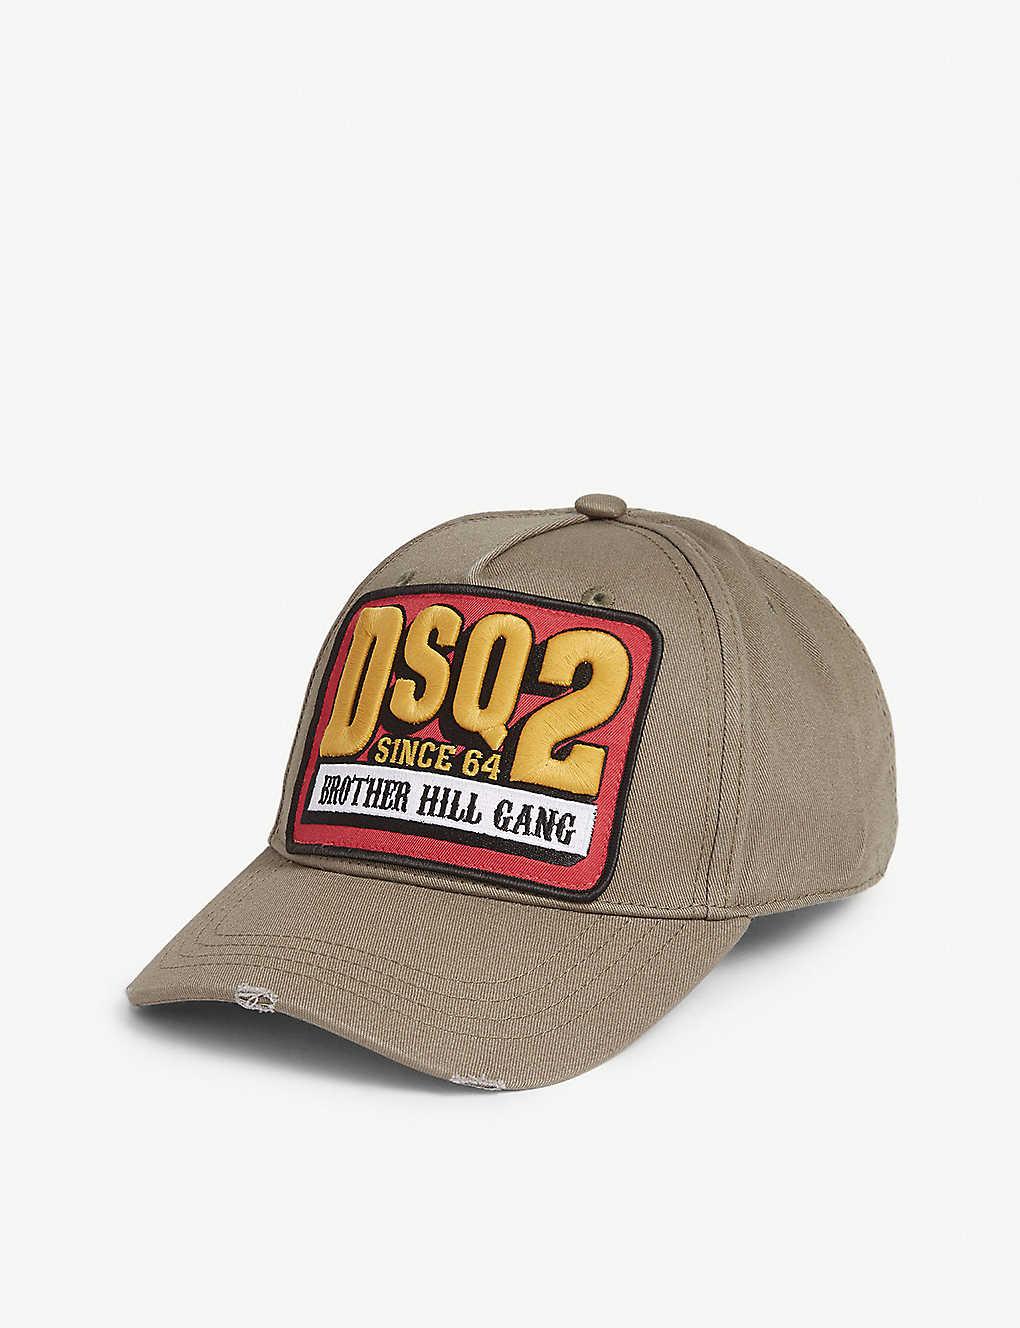 55d756da5 DSQUARED2 - Brother Hill Gang cotton baseball cap   Selfridges.com